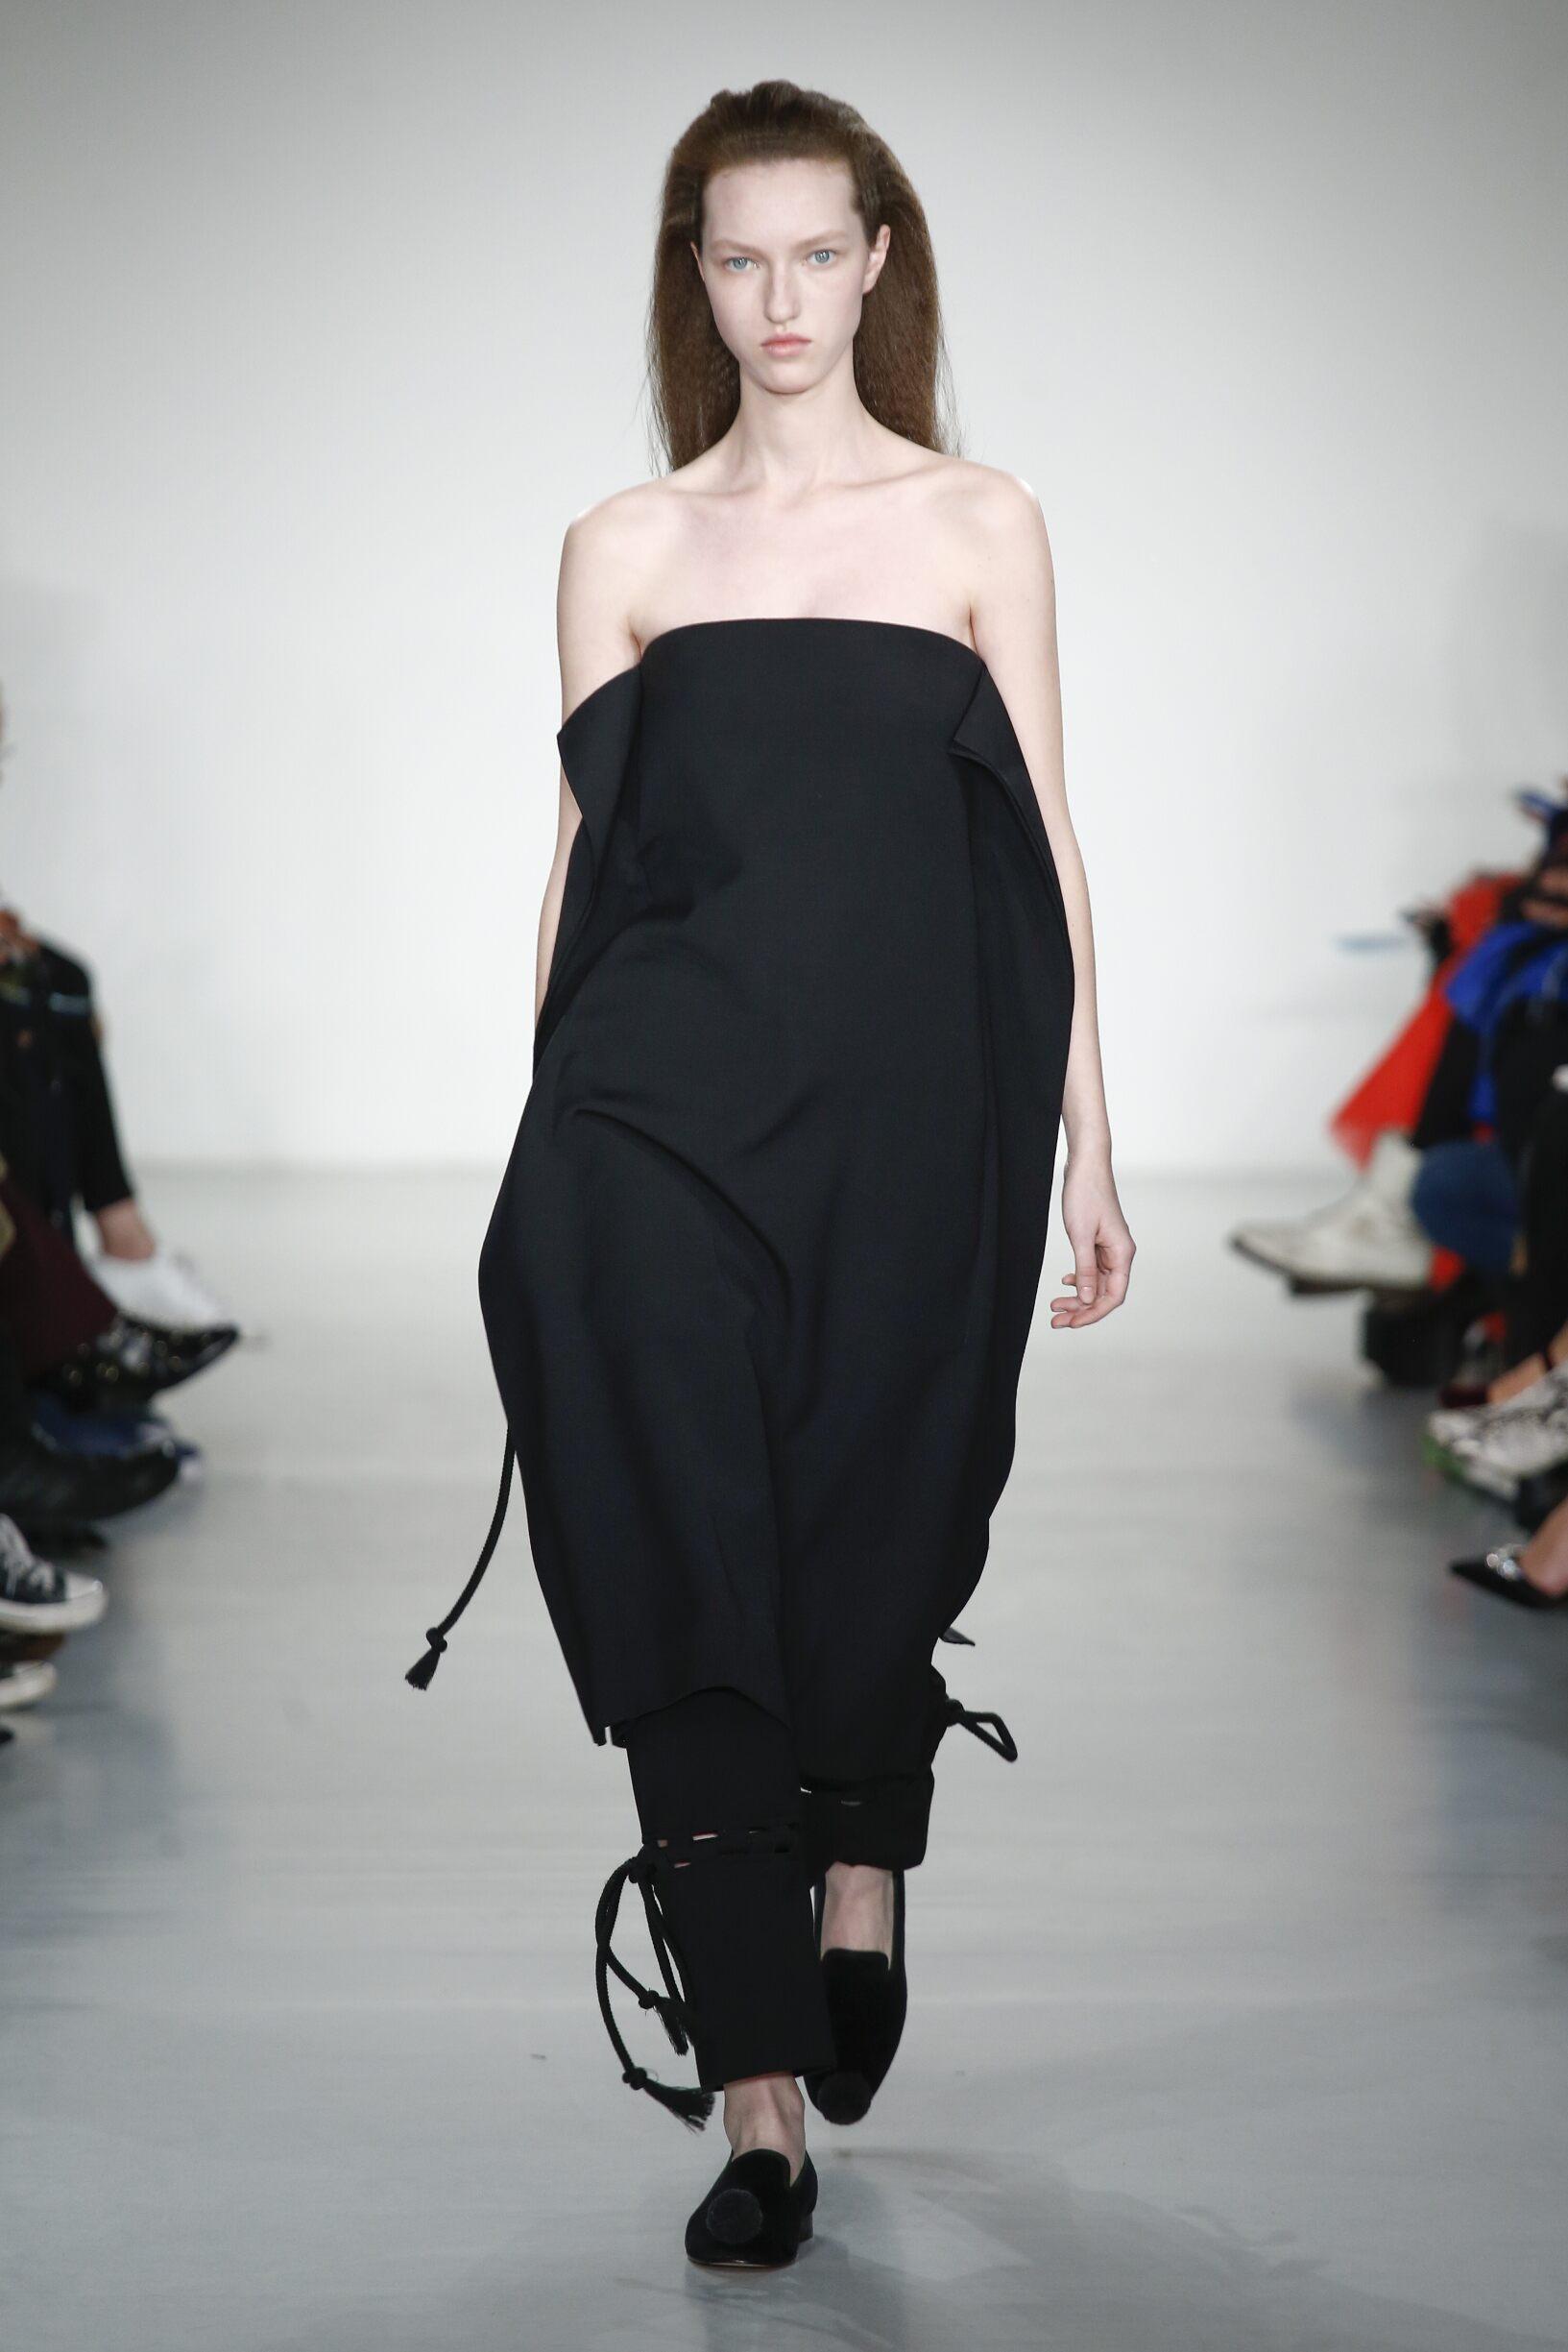 Winter 2017 Fashion Trends Ports 1961